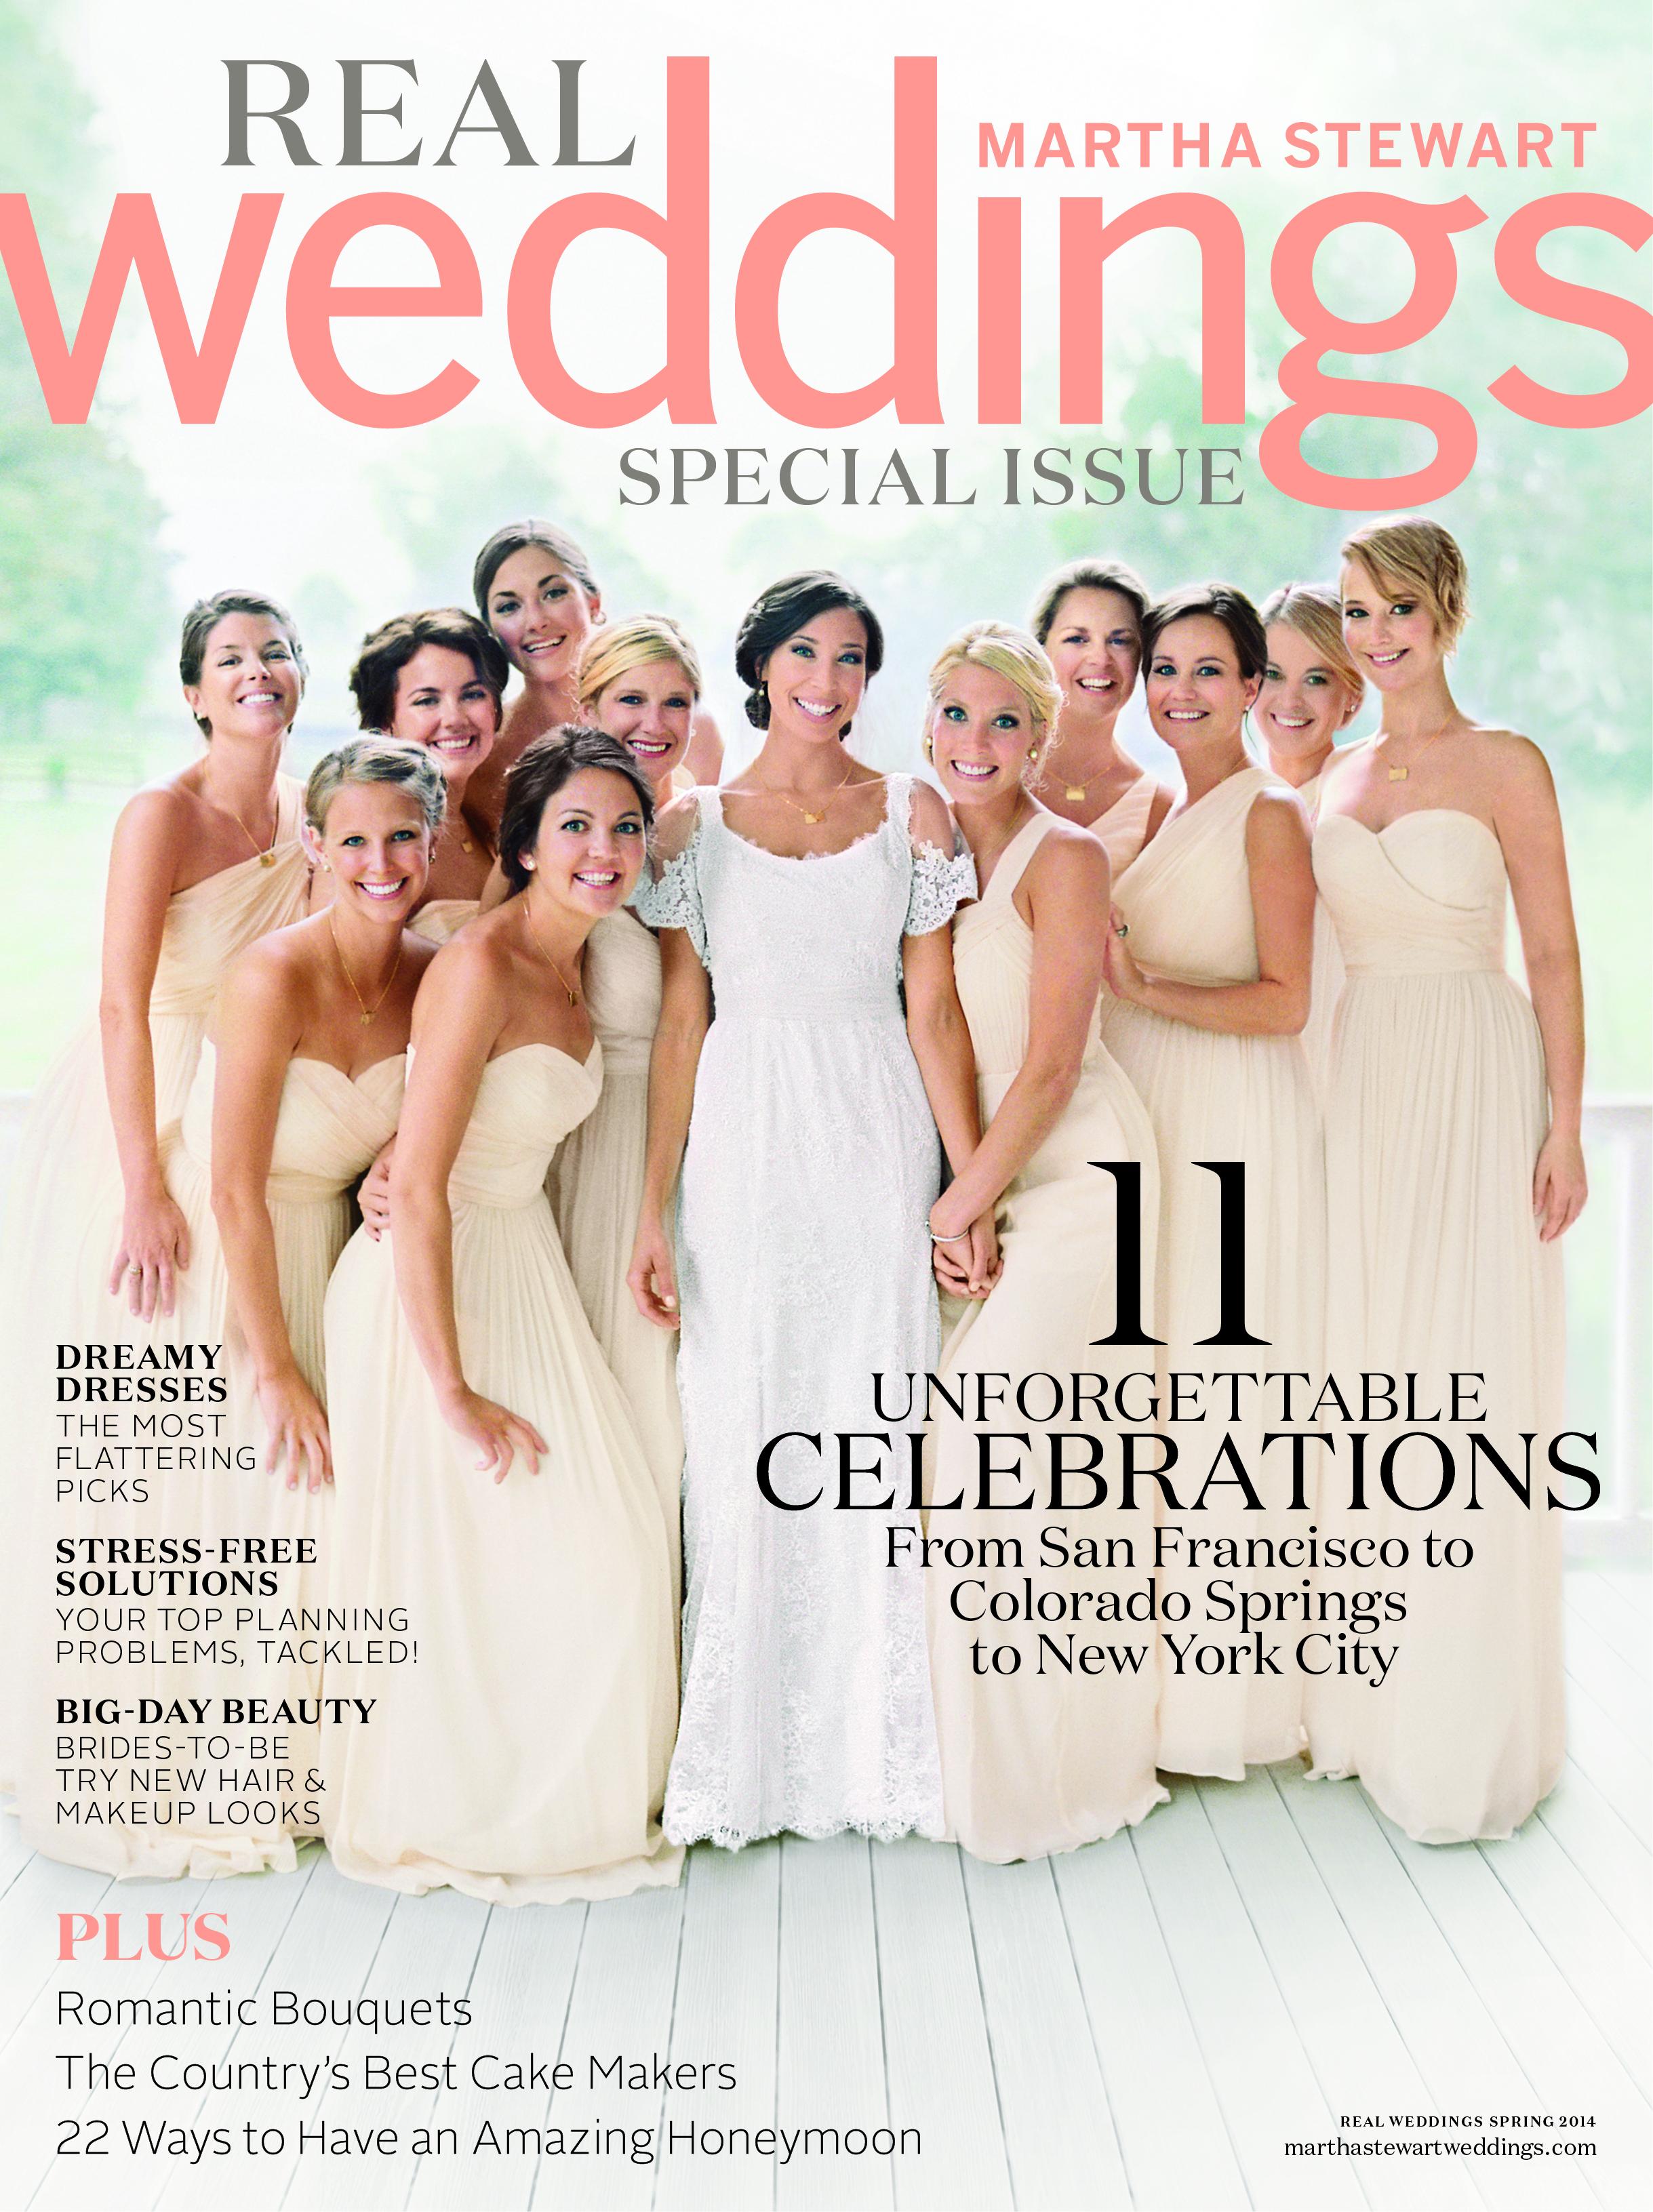 Martha Stewart Weddings Spring Real Weddings Special Issue Sneak Peek | Oh Lovely Day